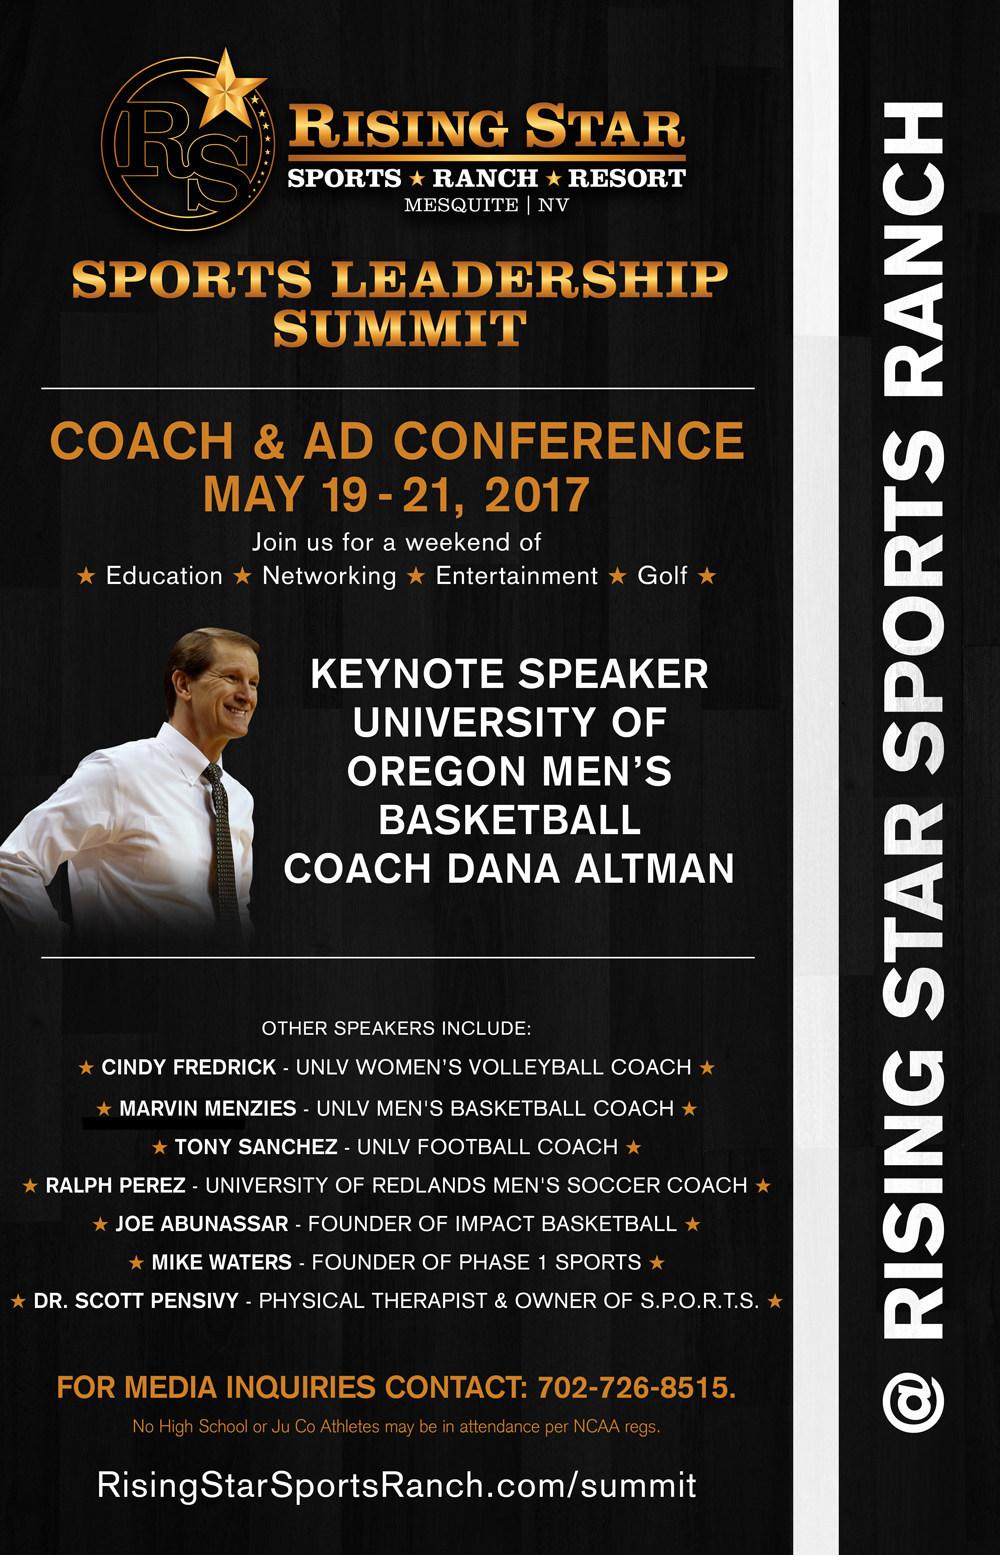 Sports Summit featuring University of Oregon Coach Dana Altman